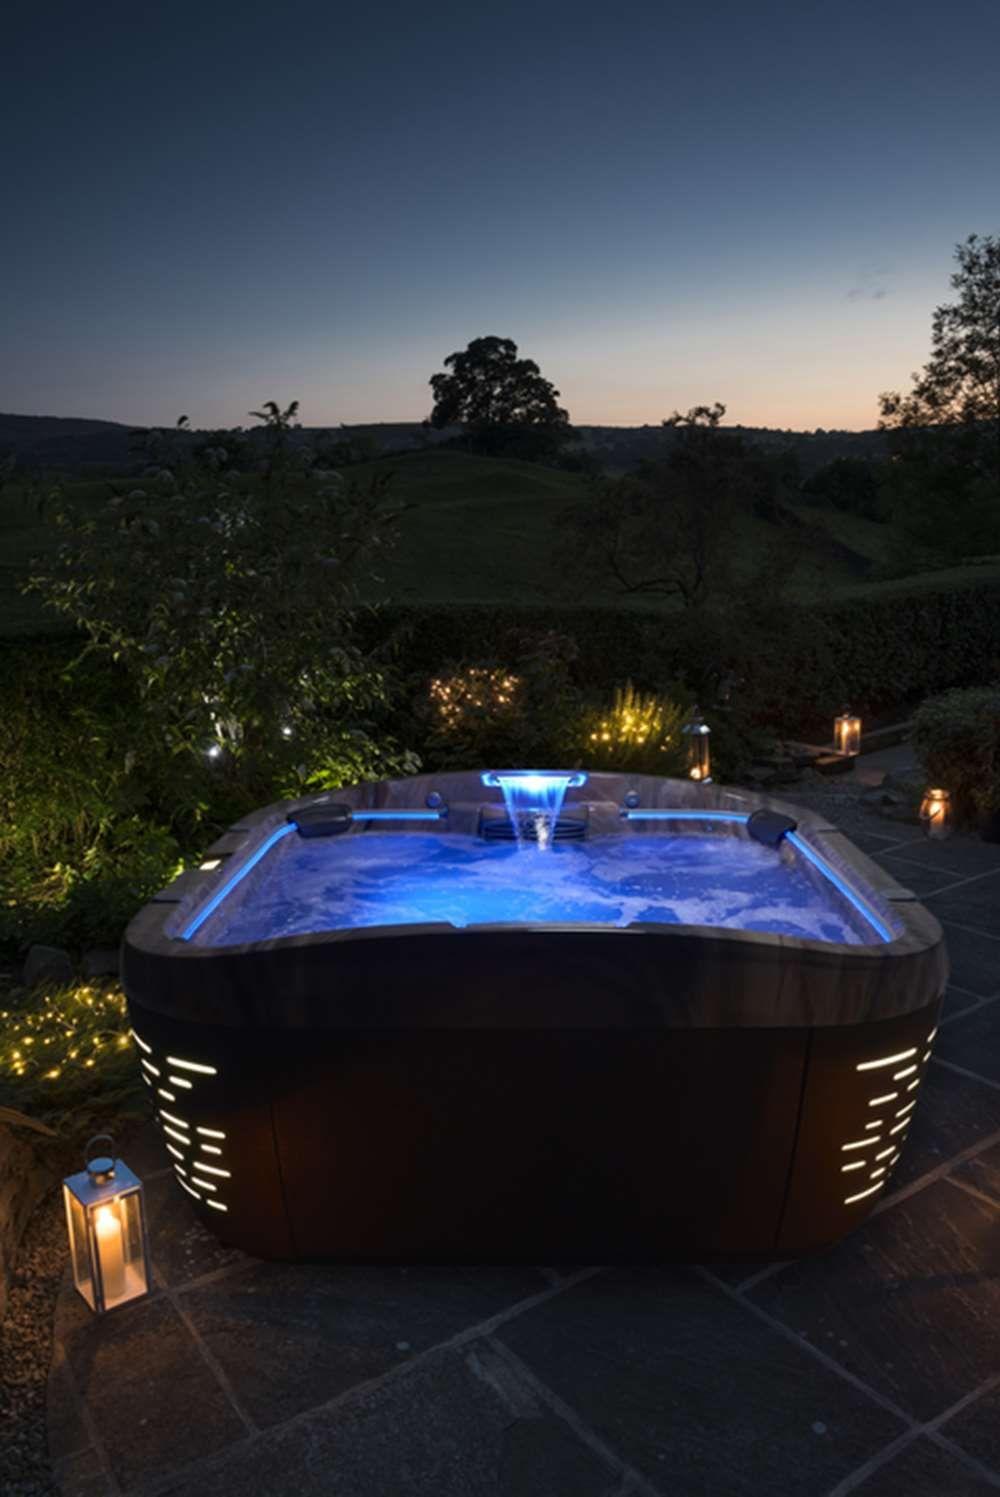 Hot Tub Lit Up At Night Hot Tub Jacuzzi Hot Tub Pool Hot Tub